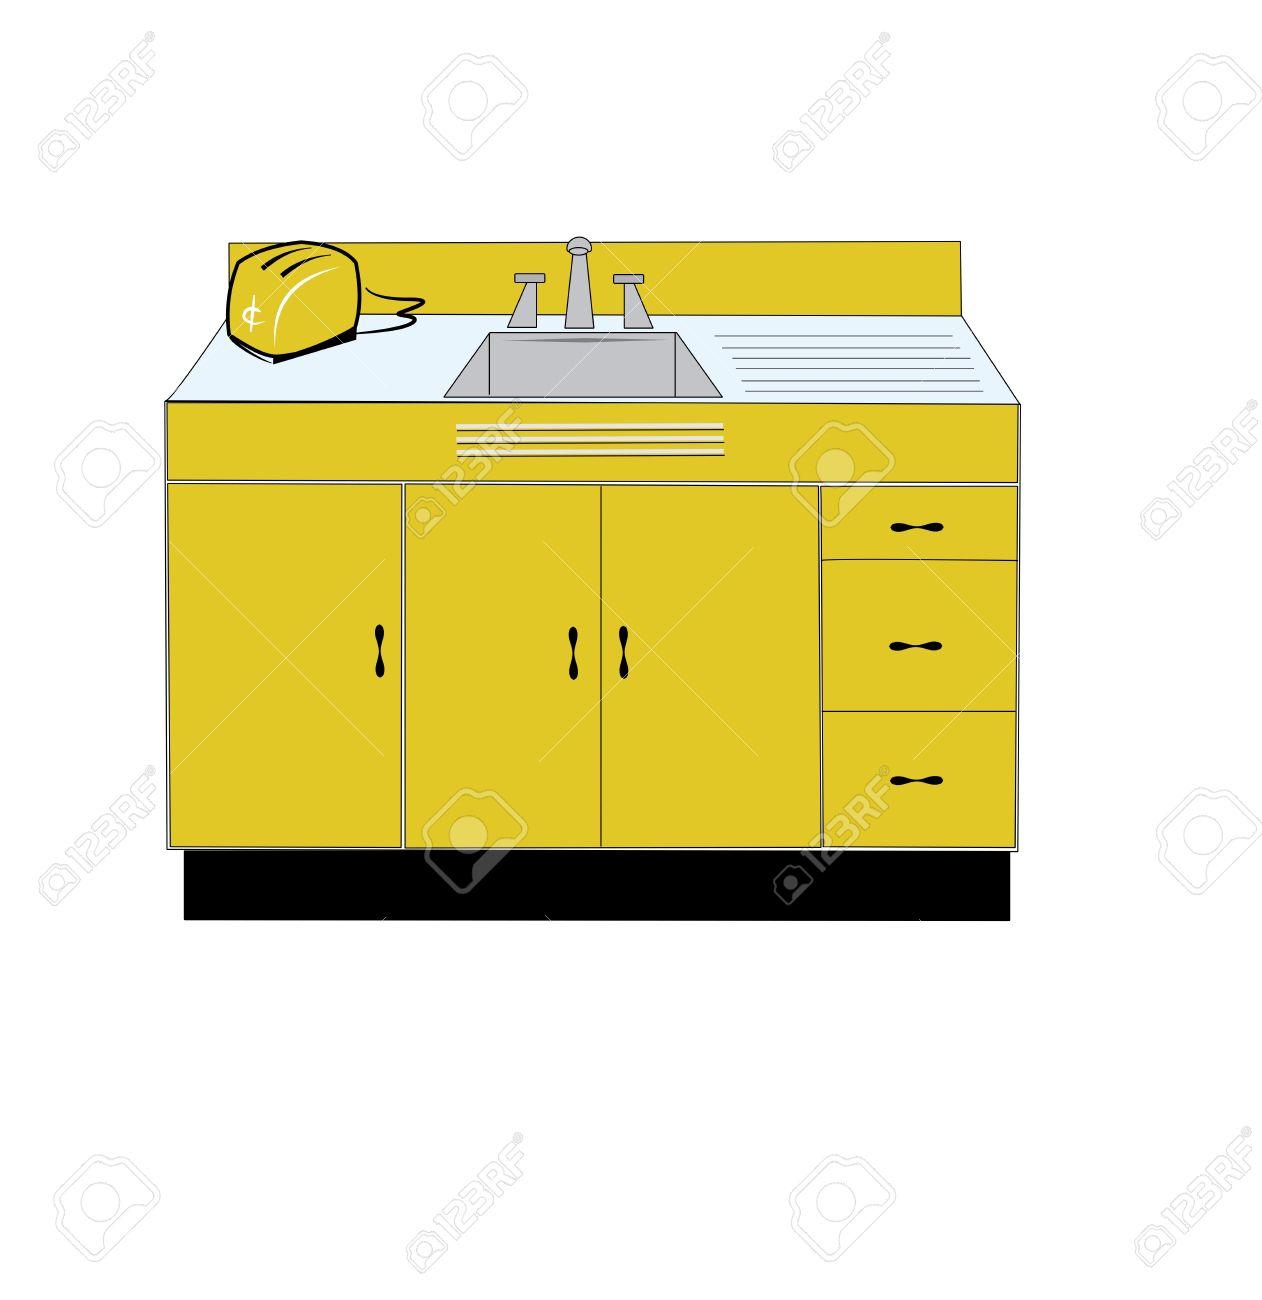 1262x1300 Kitchen Counter And Sink Clip Art. Money Counter Clip Art, Kitchen